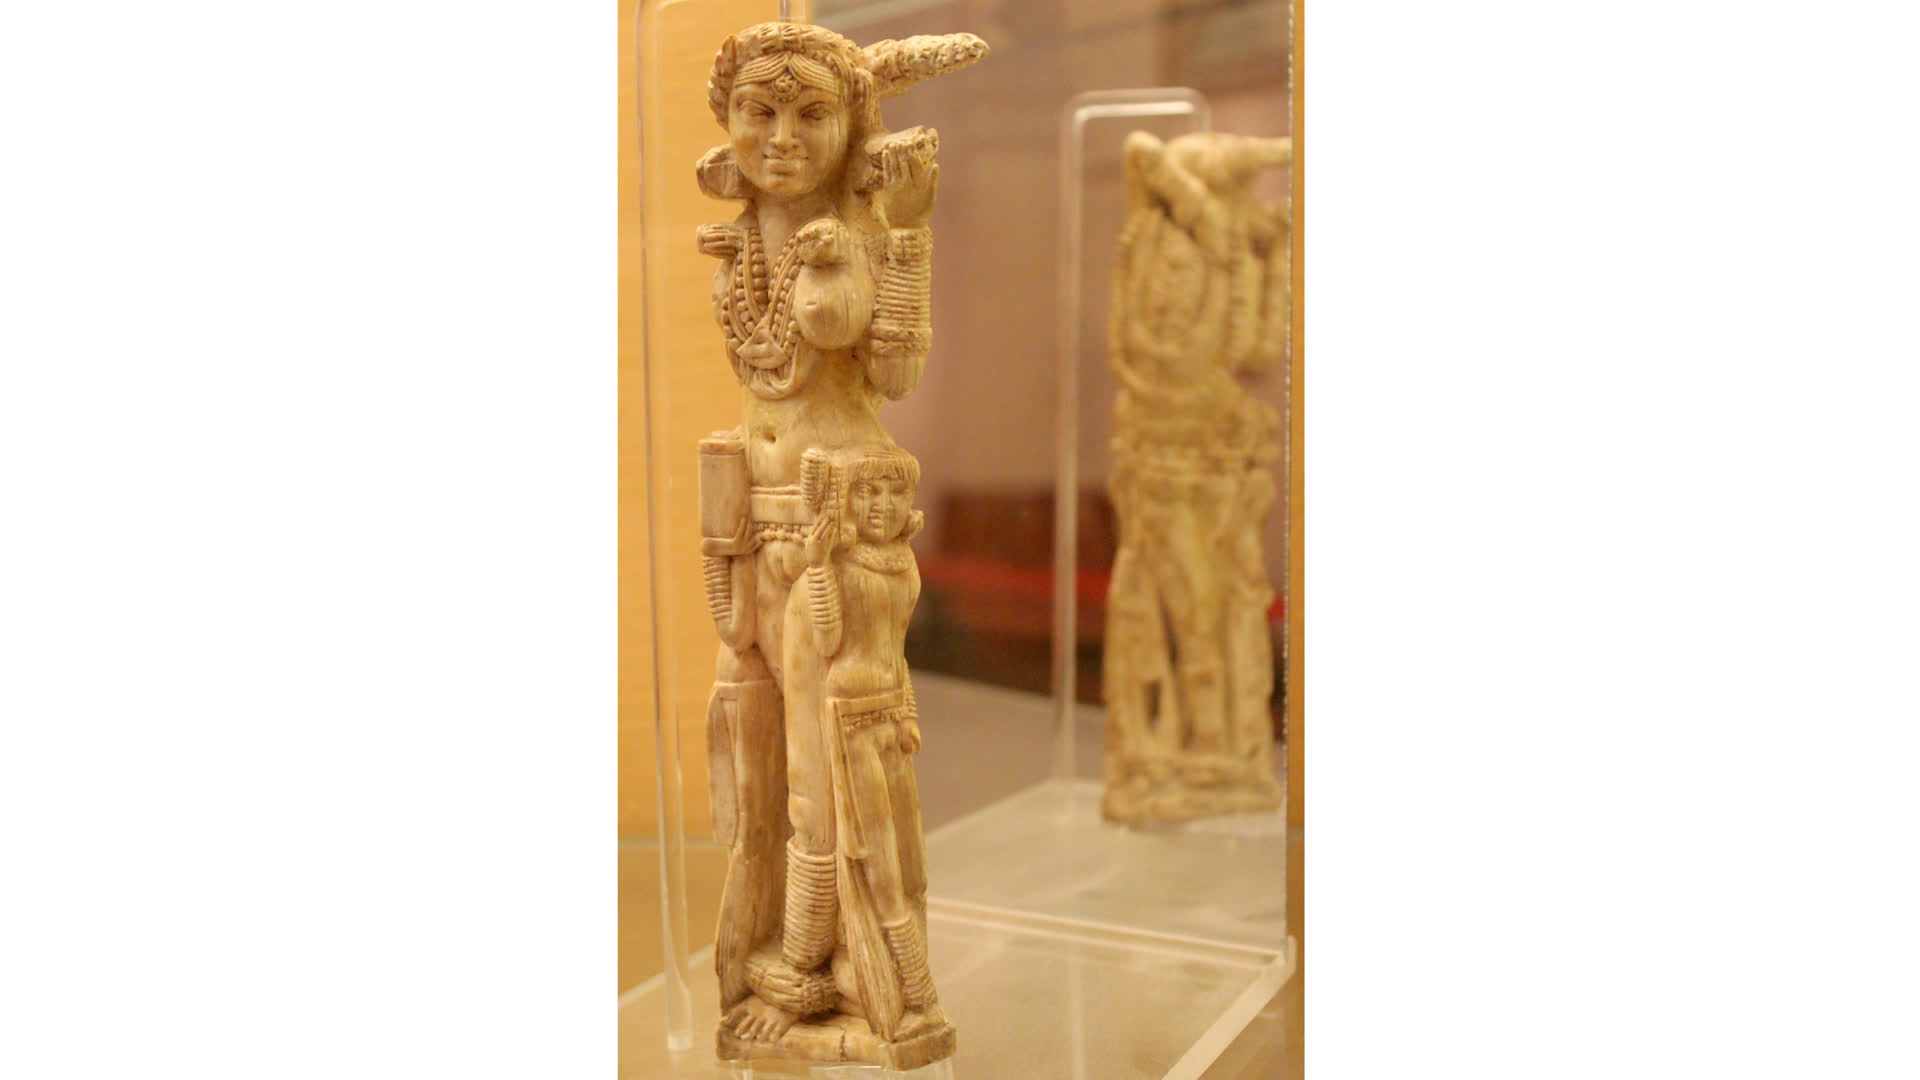 Mystery of the 'Pompeii Lakshmi'